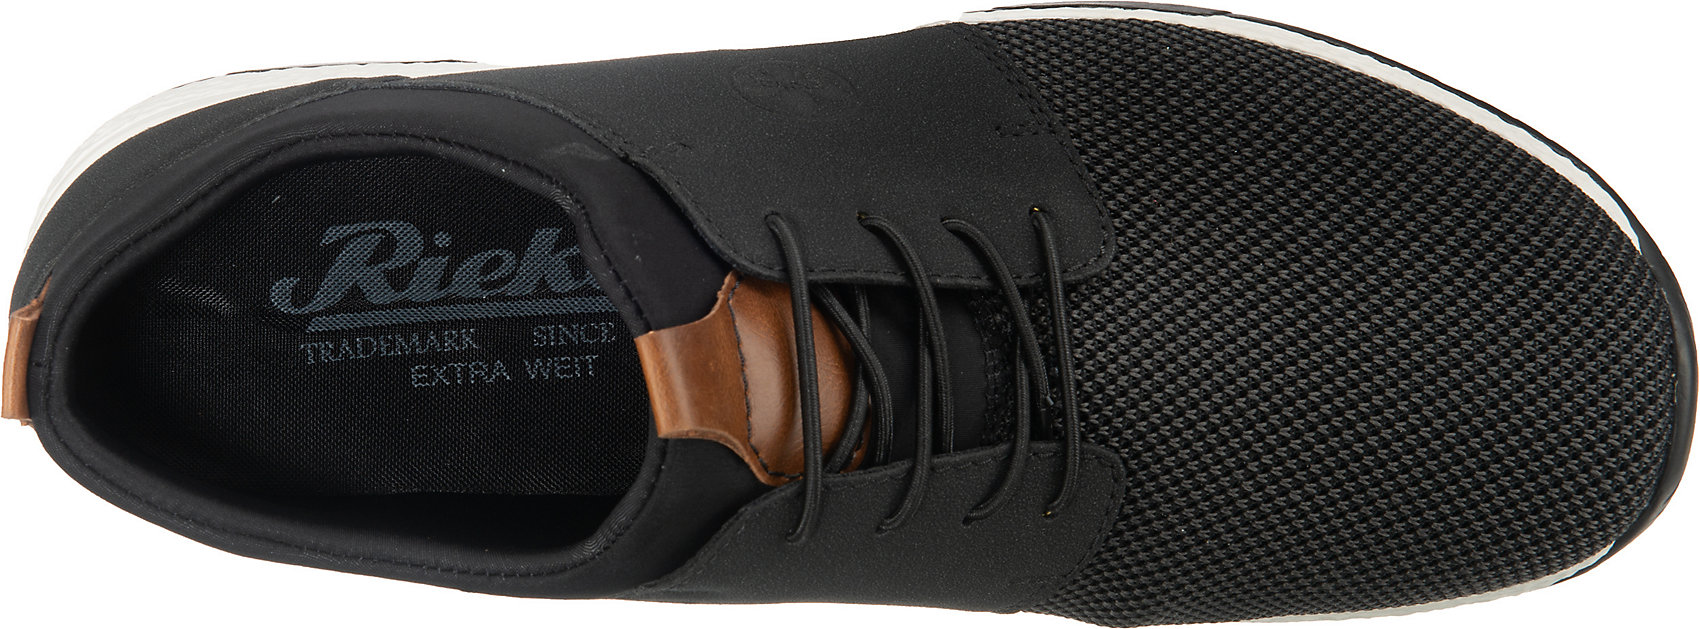 Indexbild 6 - Neu rieker Sneakers Low 12842477 für Herren schwarz